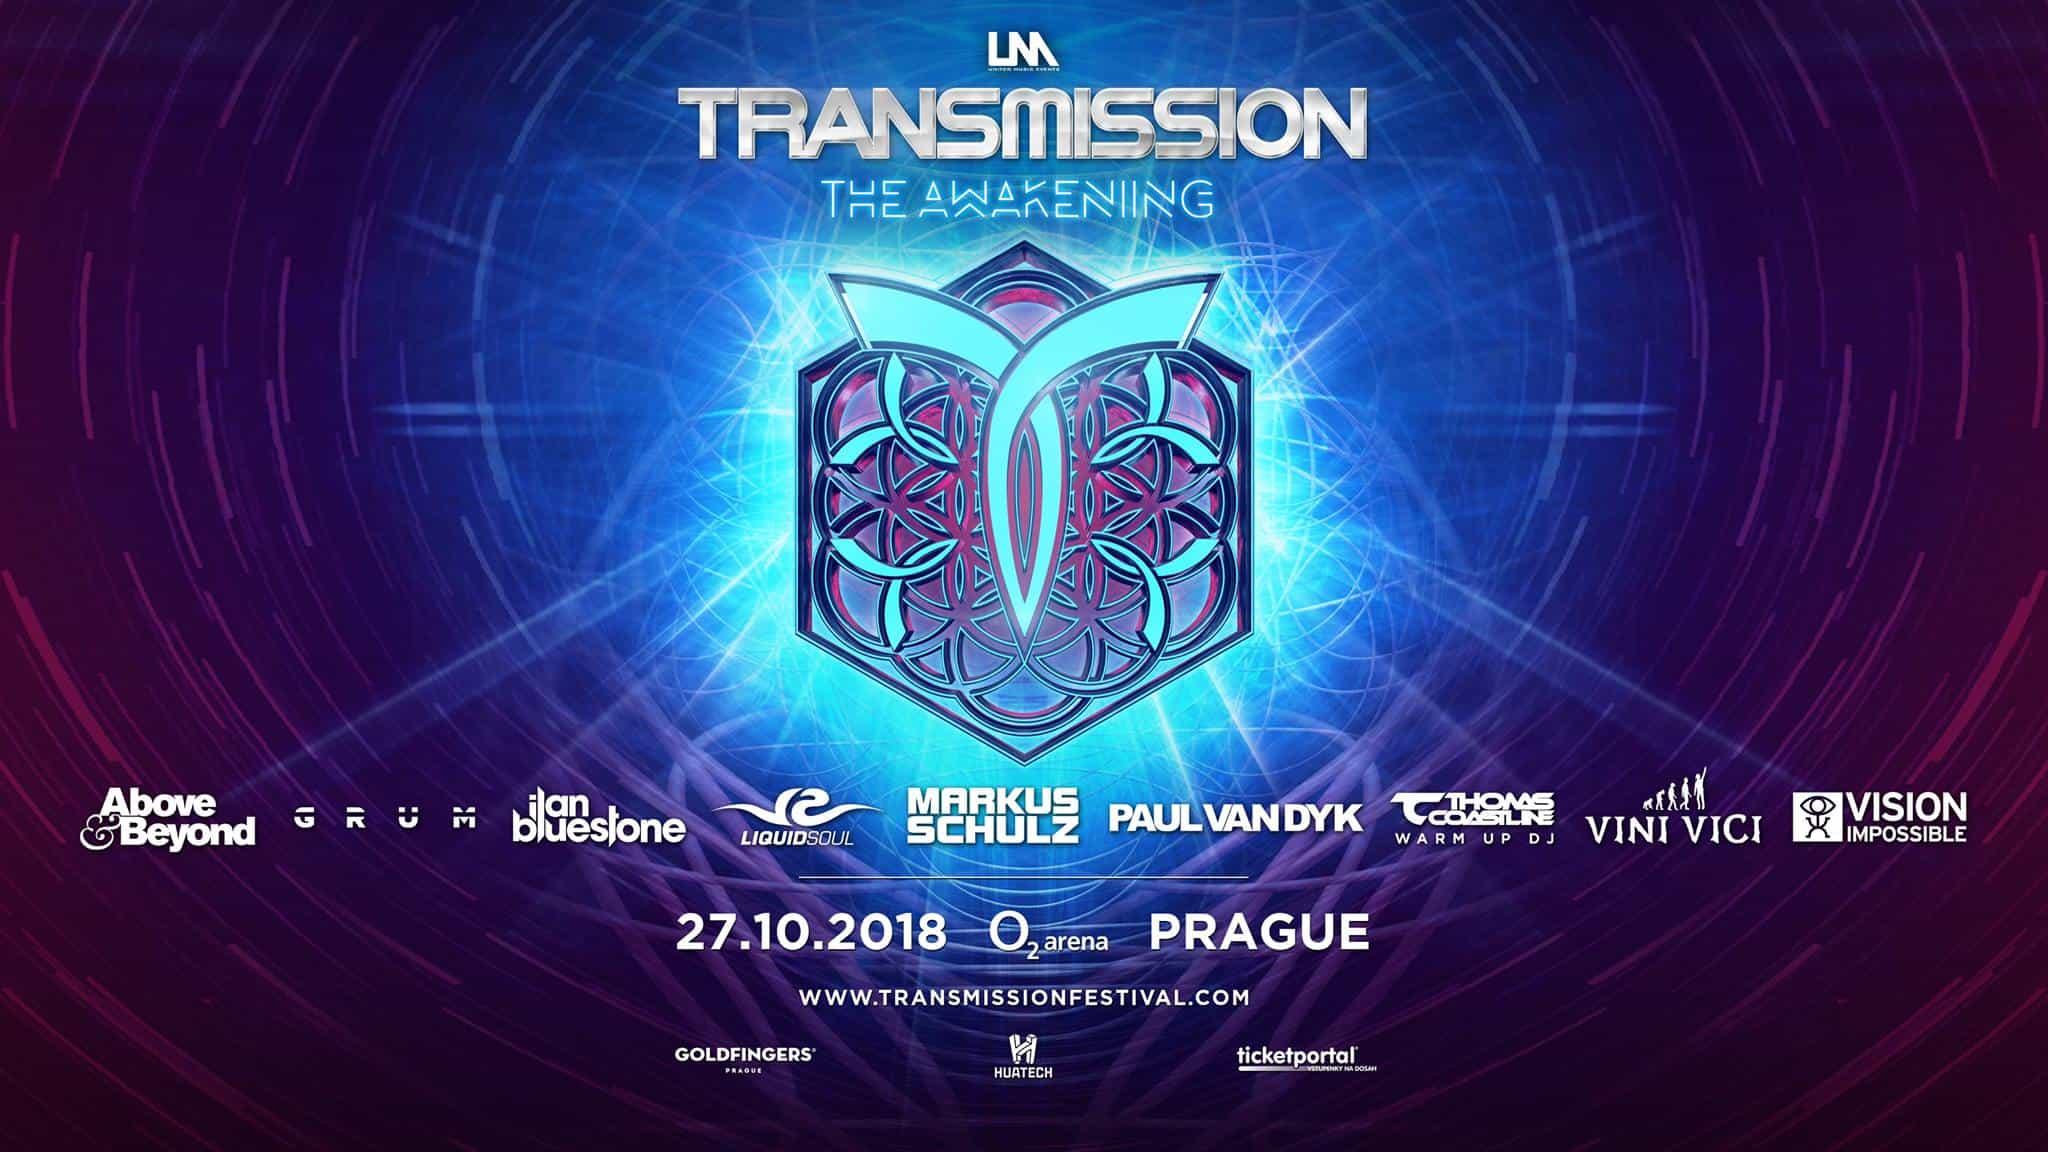 Transmission 2018 - The Awakening